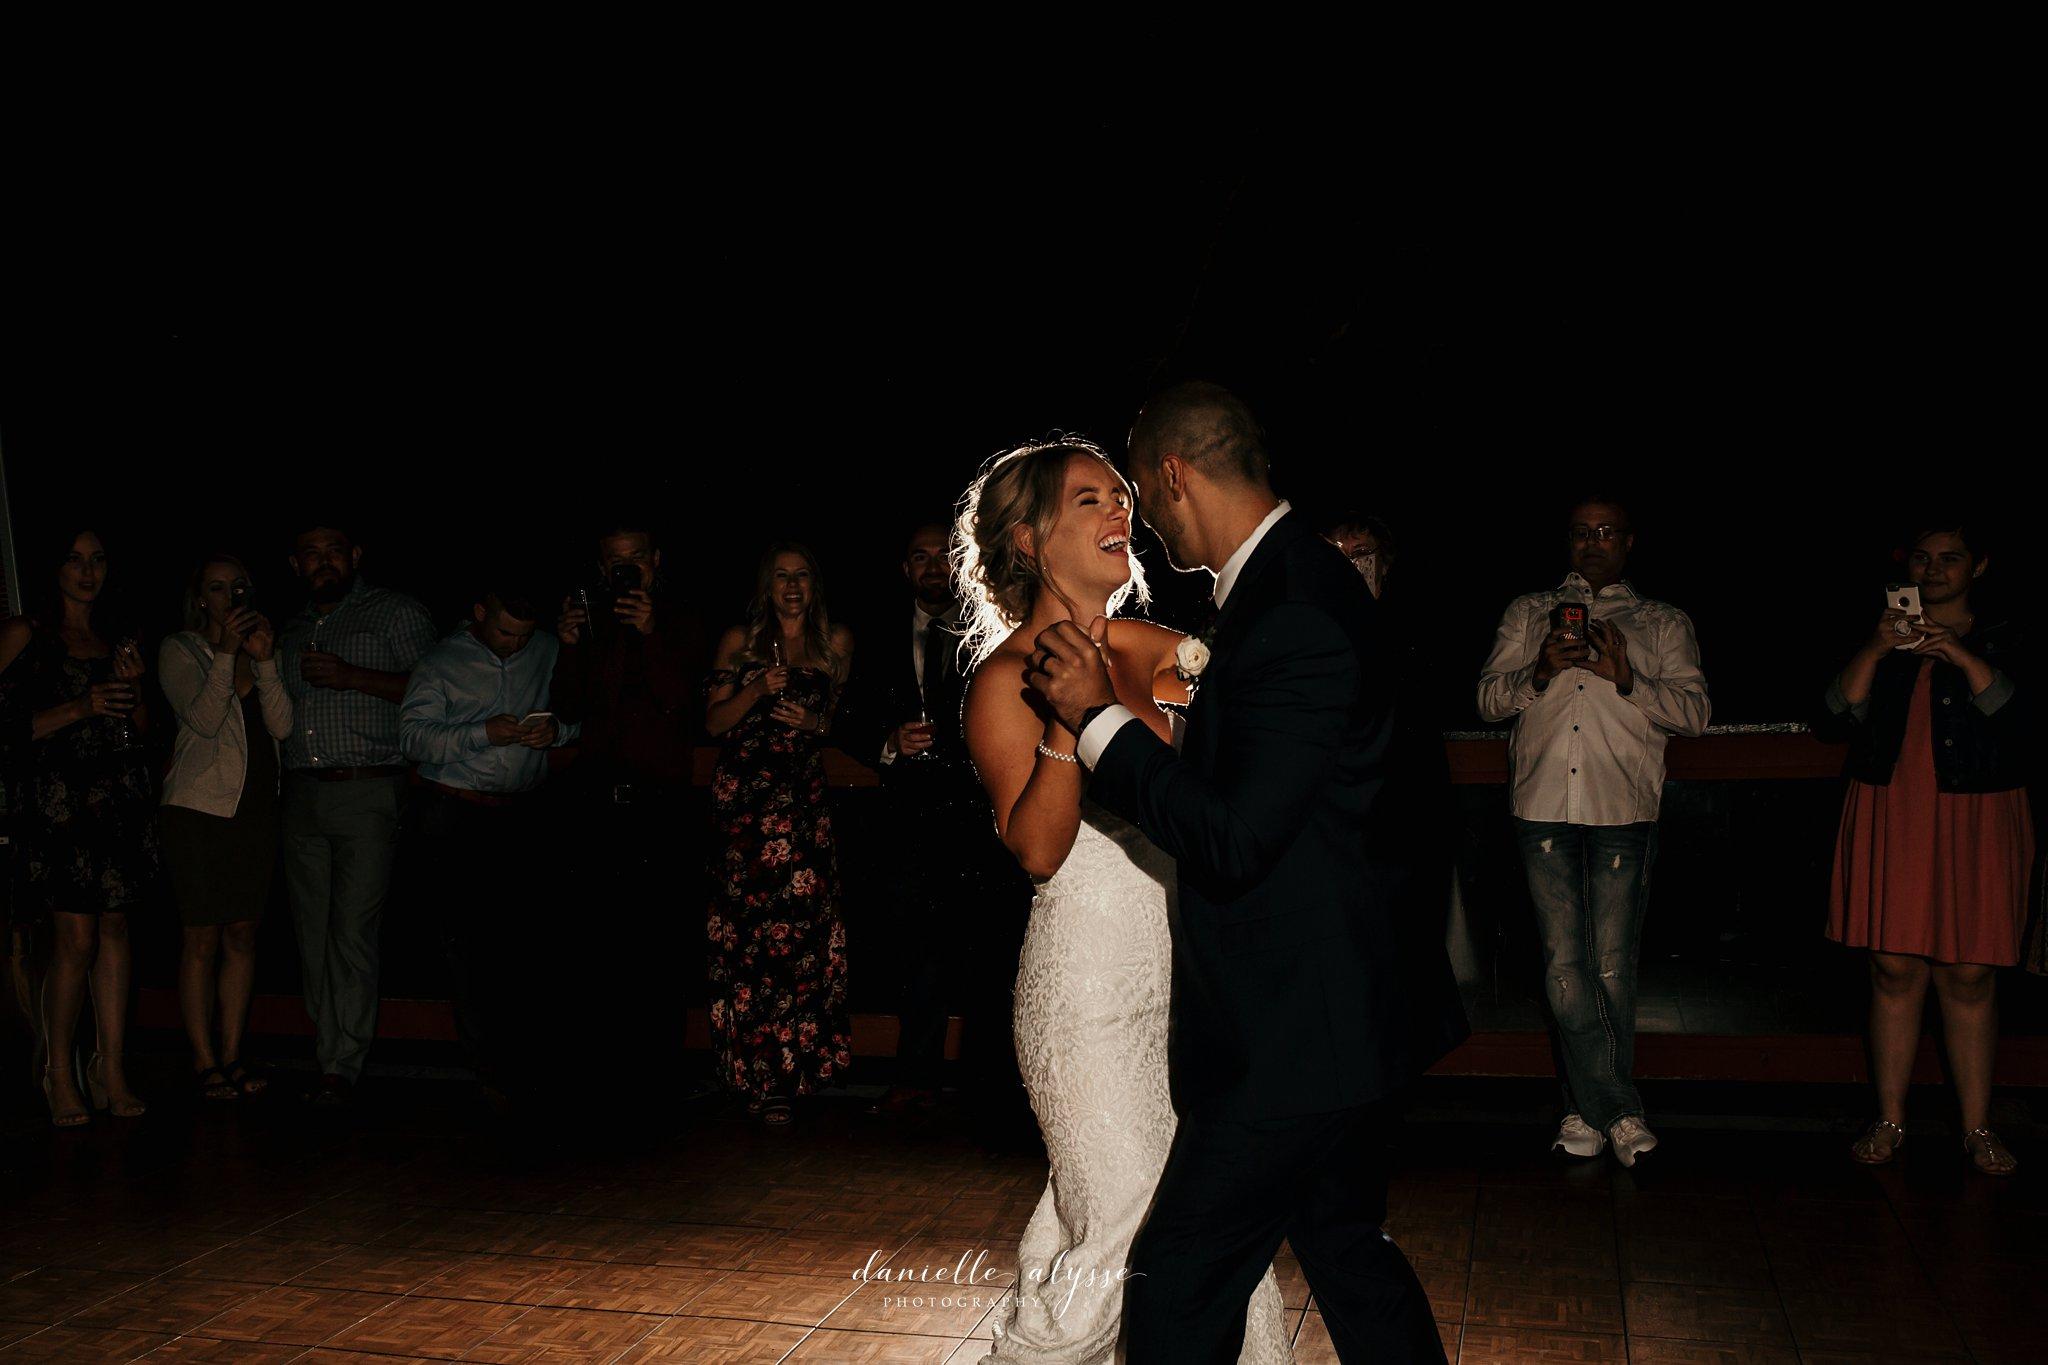 180831_wedding_stephanie_heavenly_south_lake_tahoe_danielle_alysse_photography_destination_blog_1173_WEB.jpg